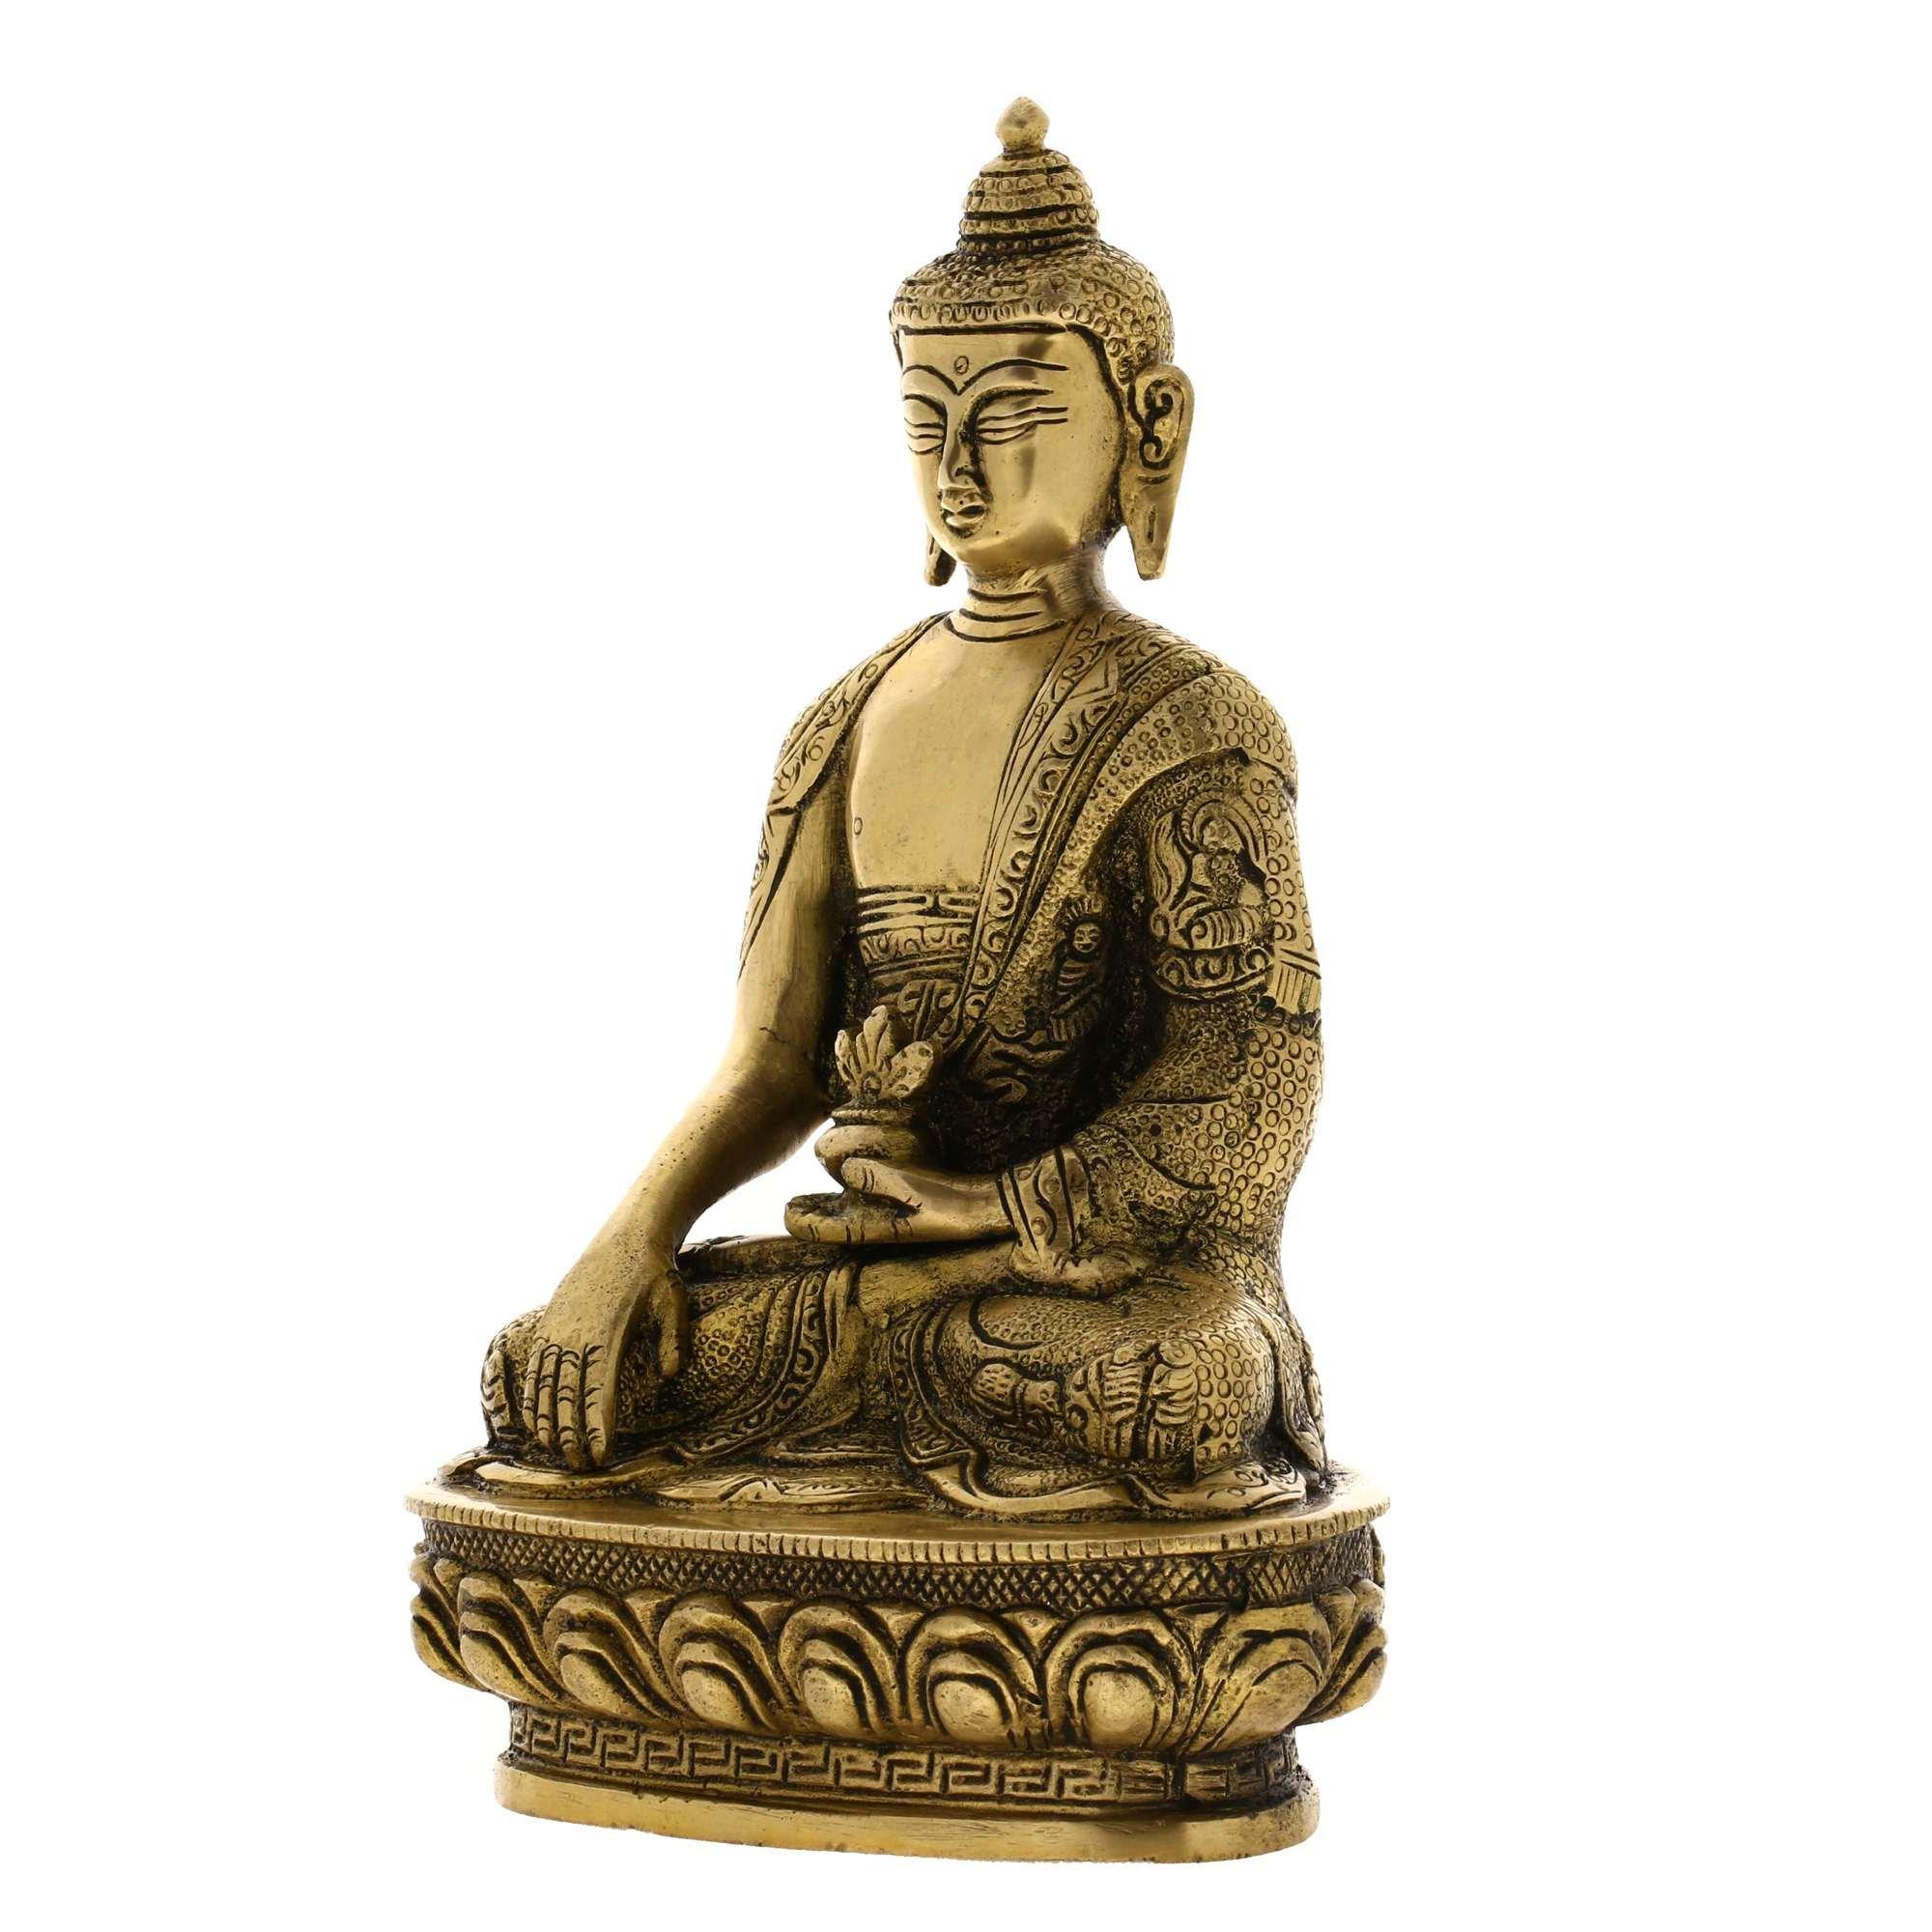 Handmade Seated Buddha Statue Sculpture India Metal Sculpture Spiritual Gifts by ShalinIndia (Image #4)